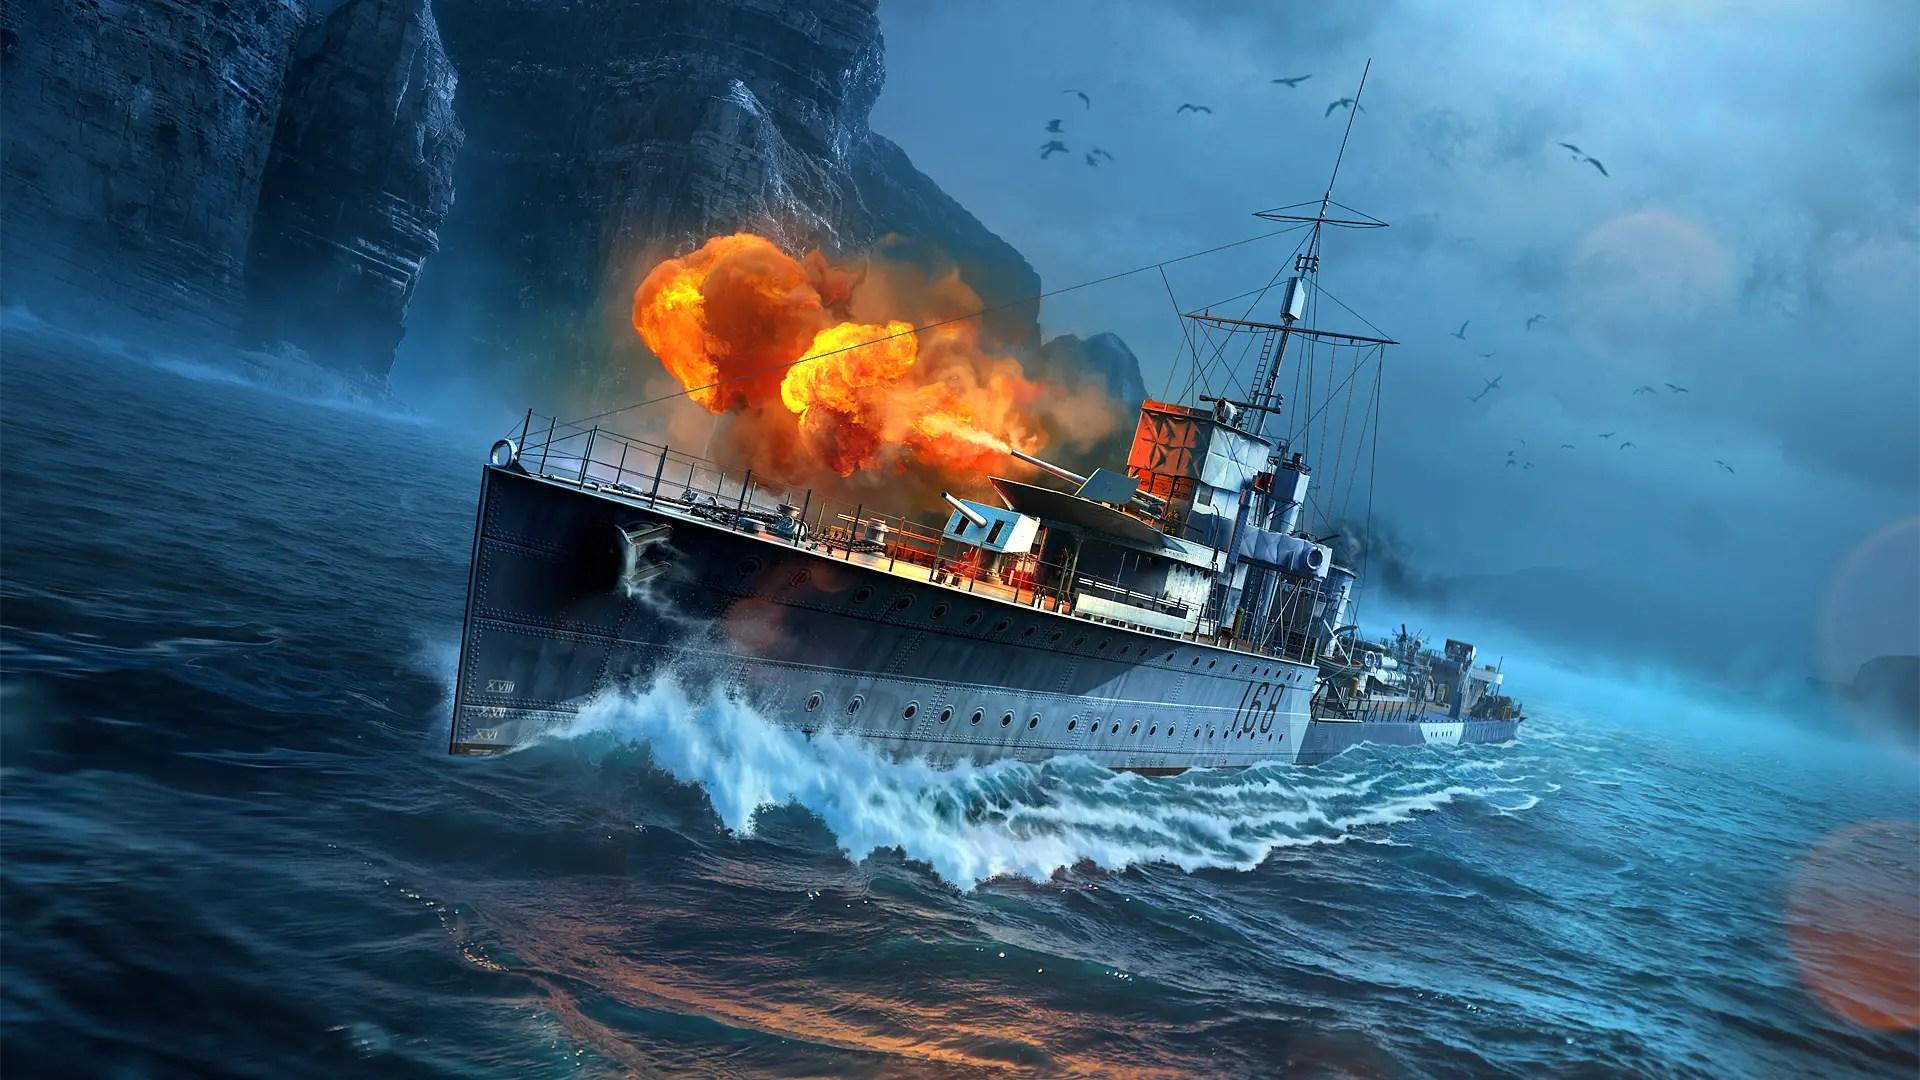 Wallpaper Girl 8k World Of Warships Vampire Mission Marathon